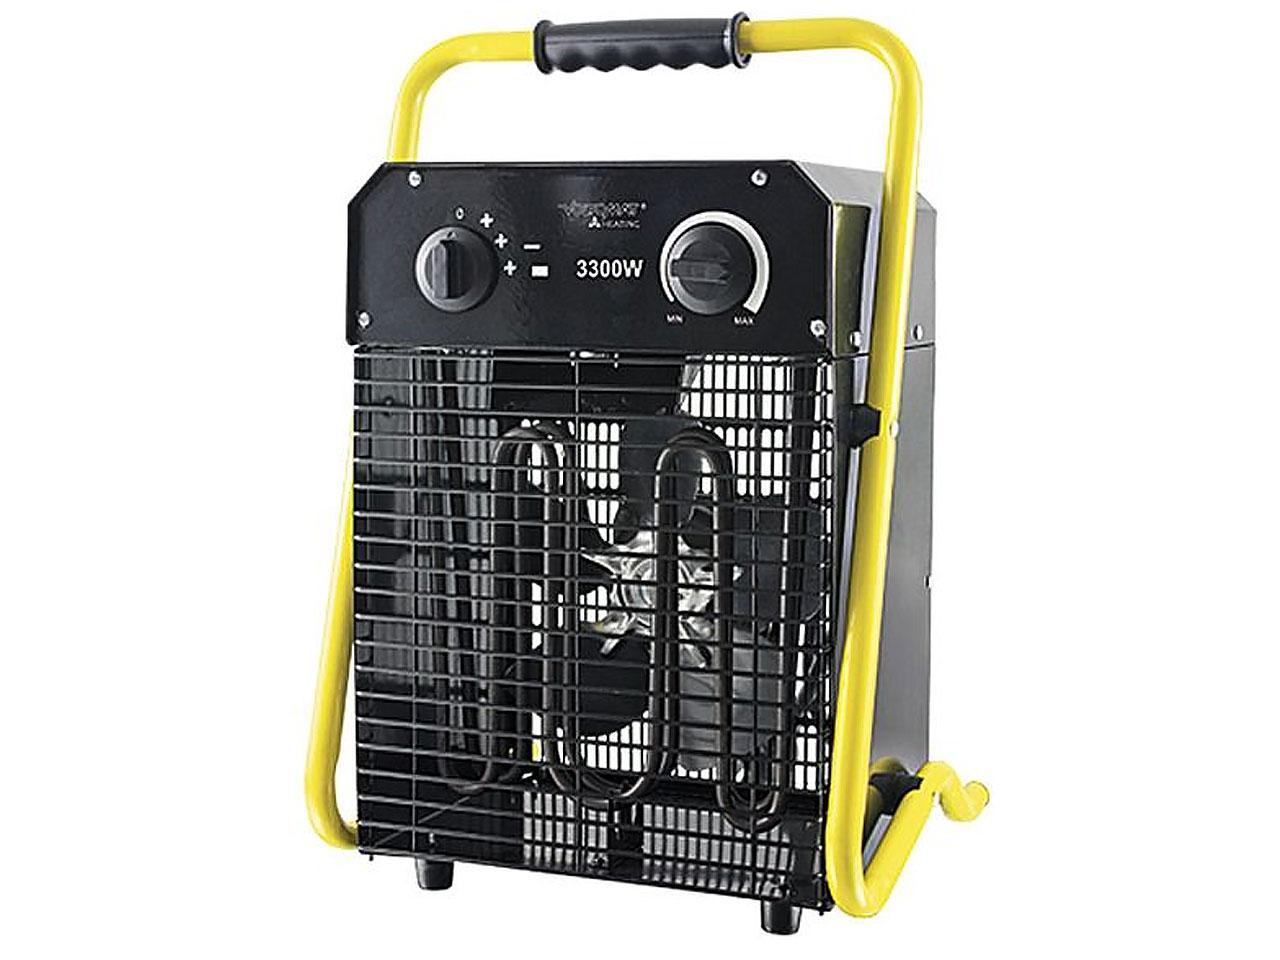 VOLTOMAT Heating LIH-3300E